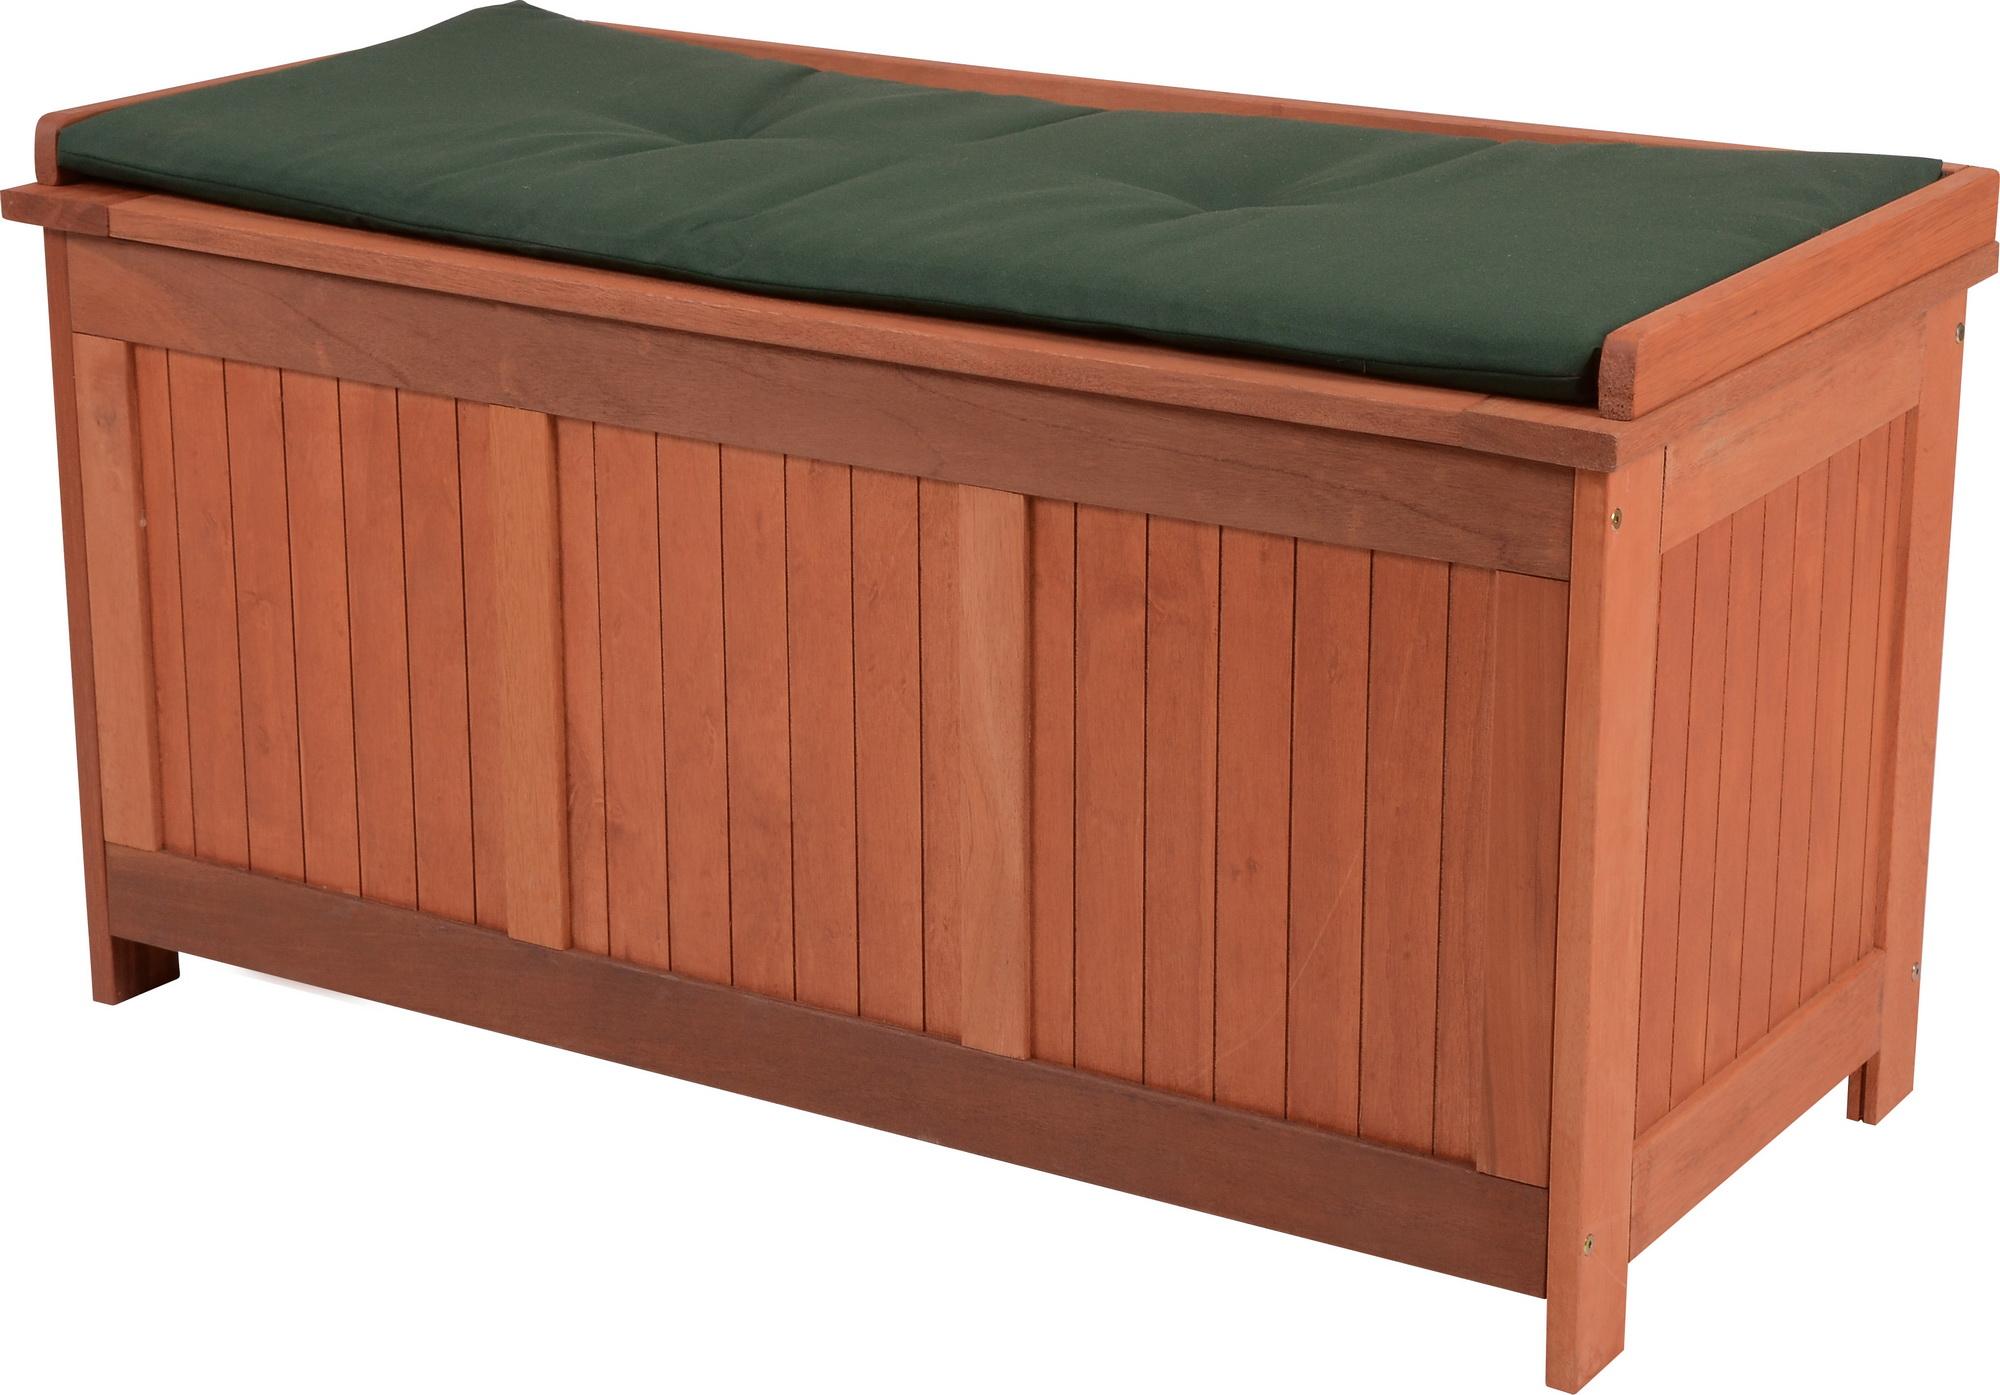 Záhradná lavička - Hecht - Toybox (meranti)